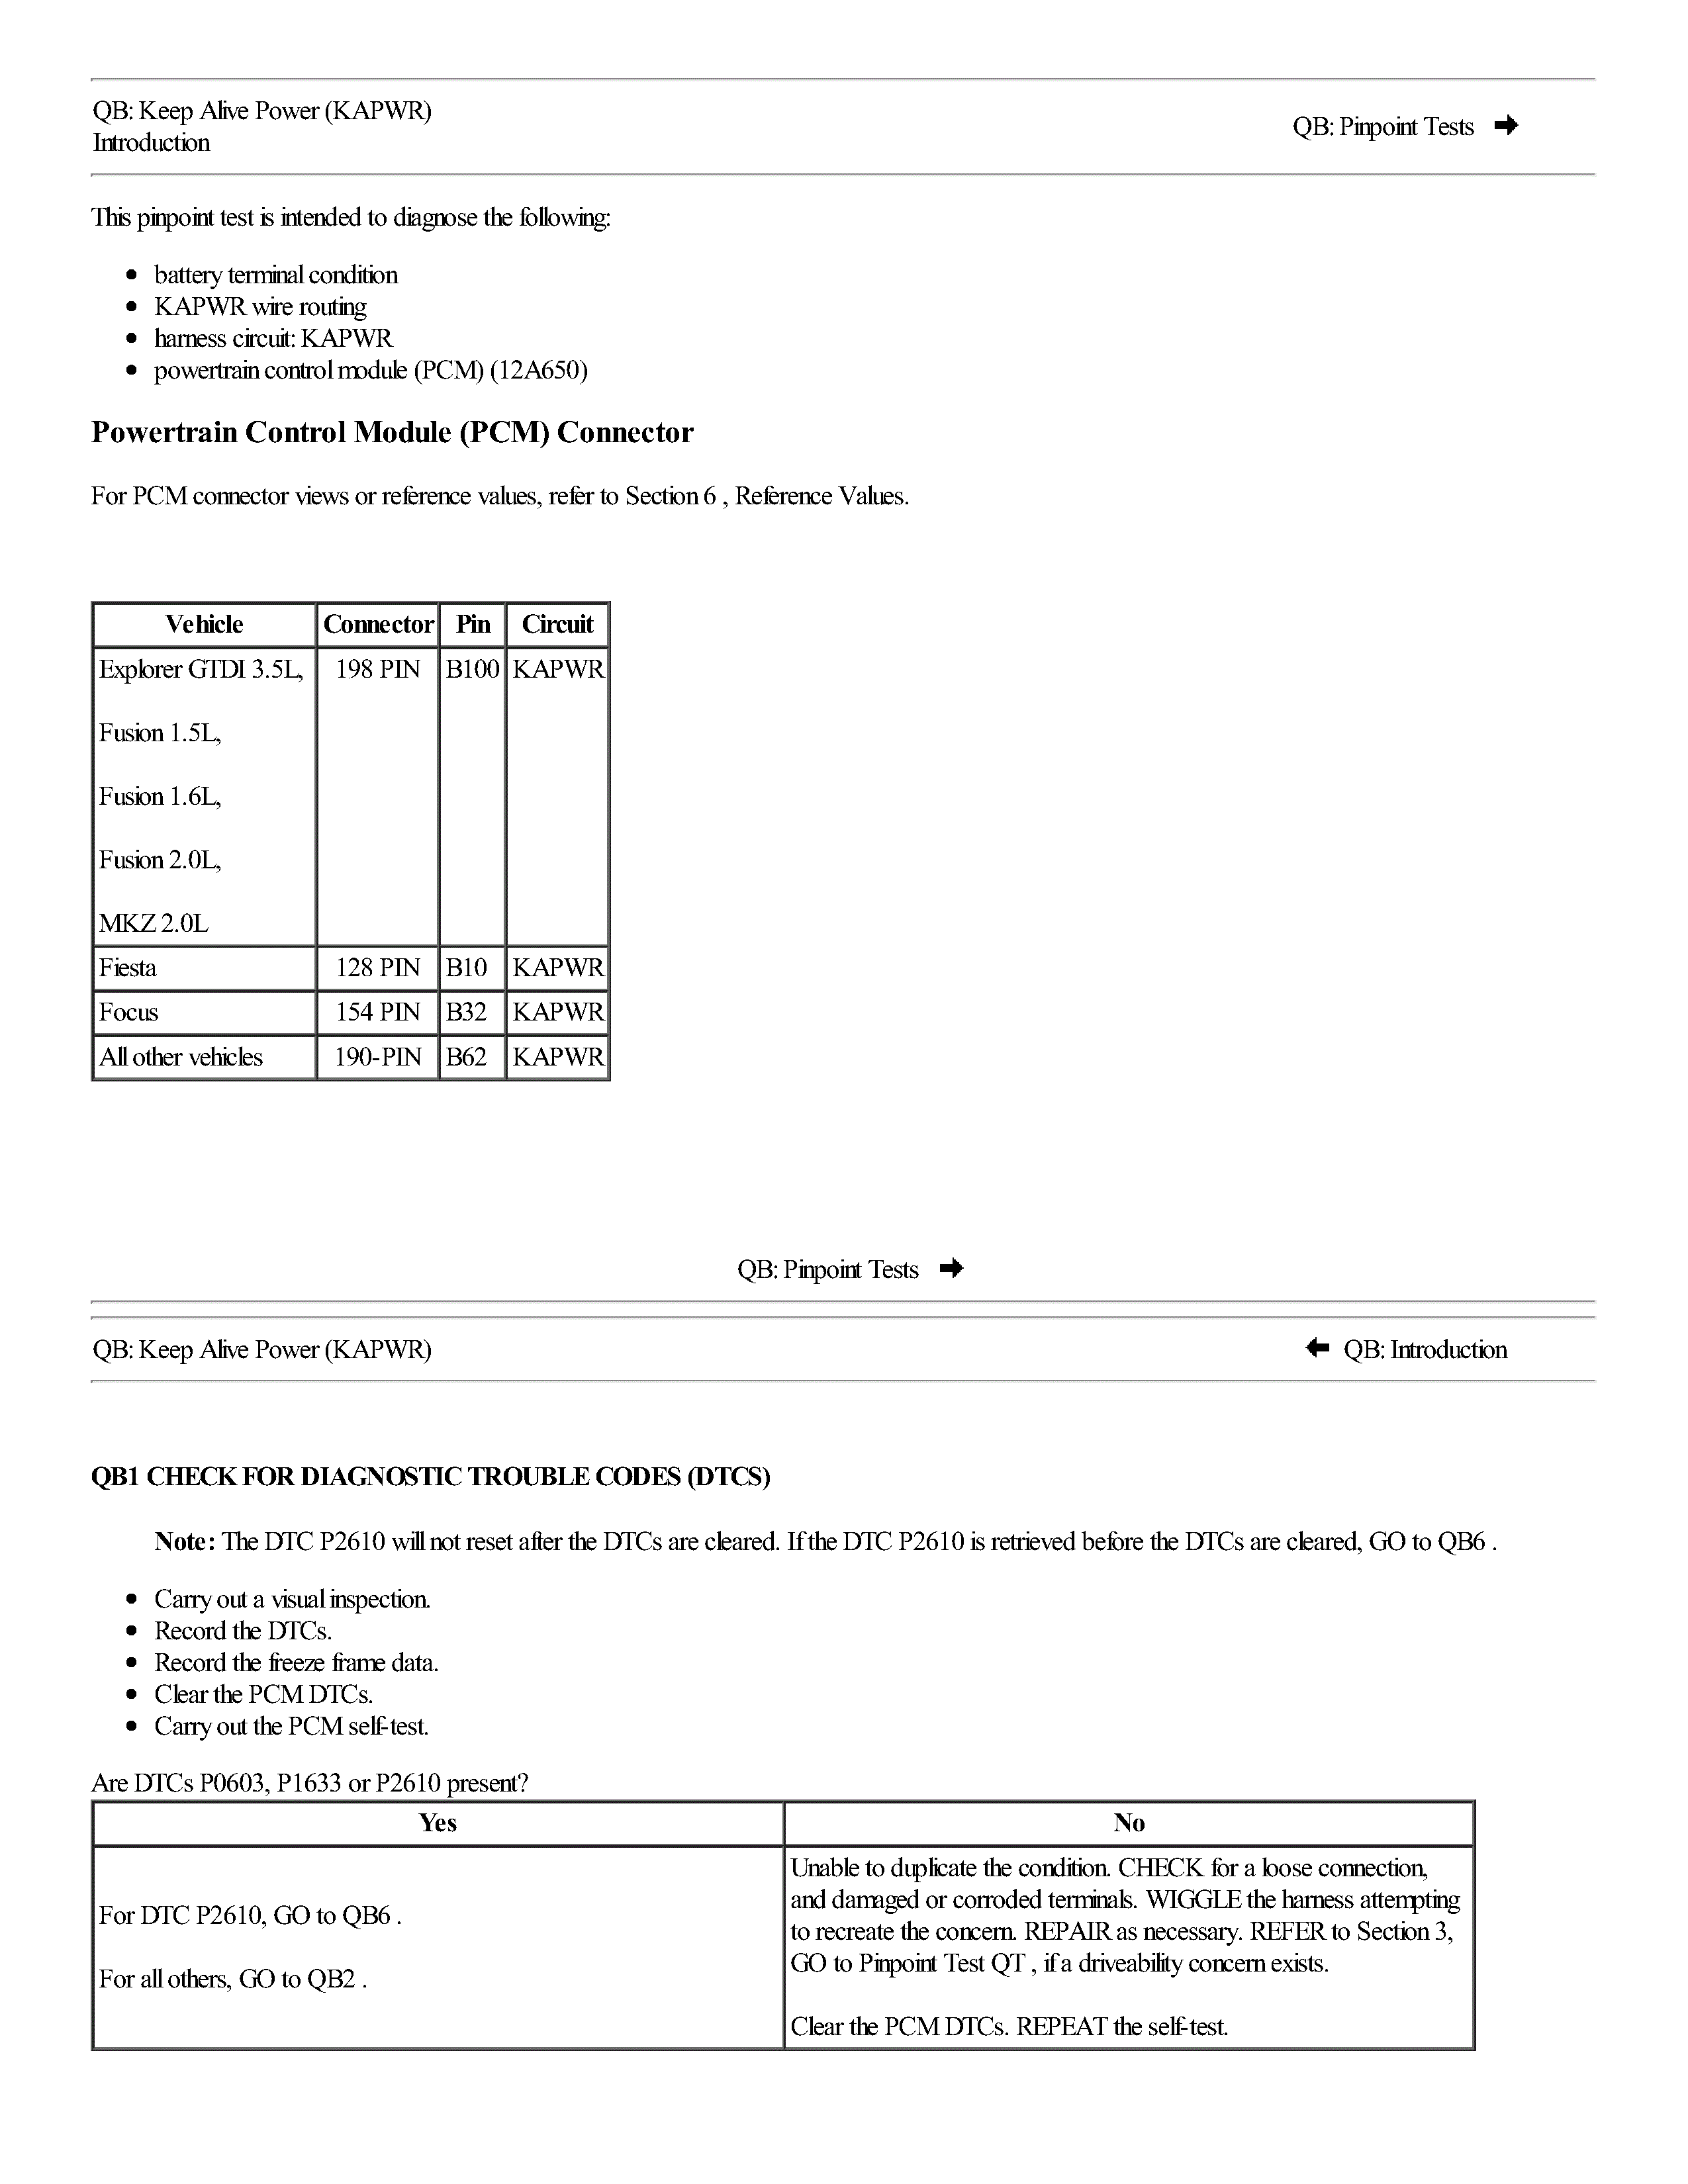 pinpoint-test-qb